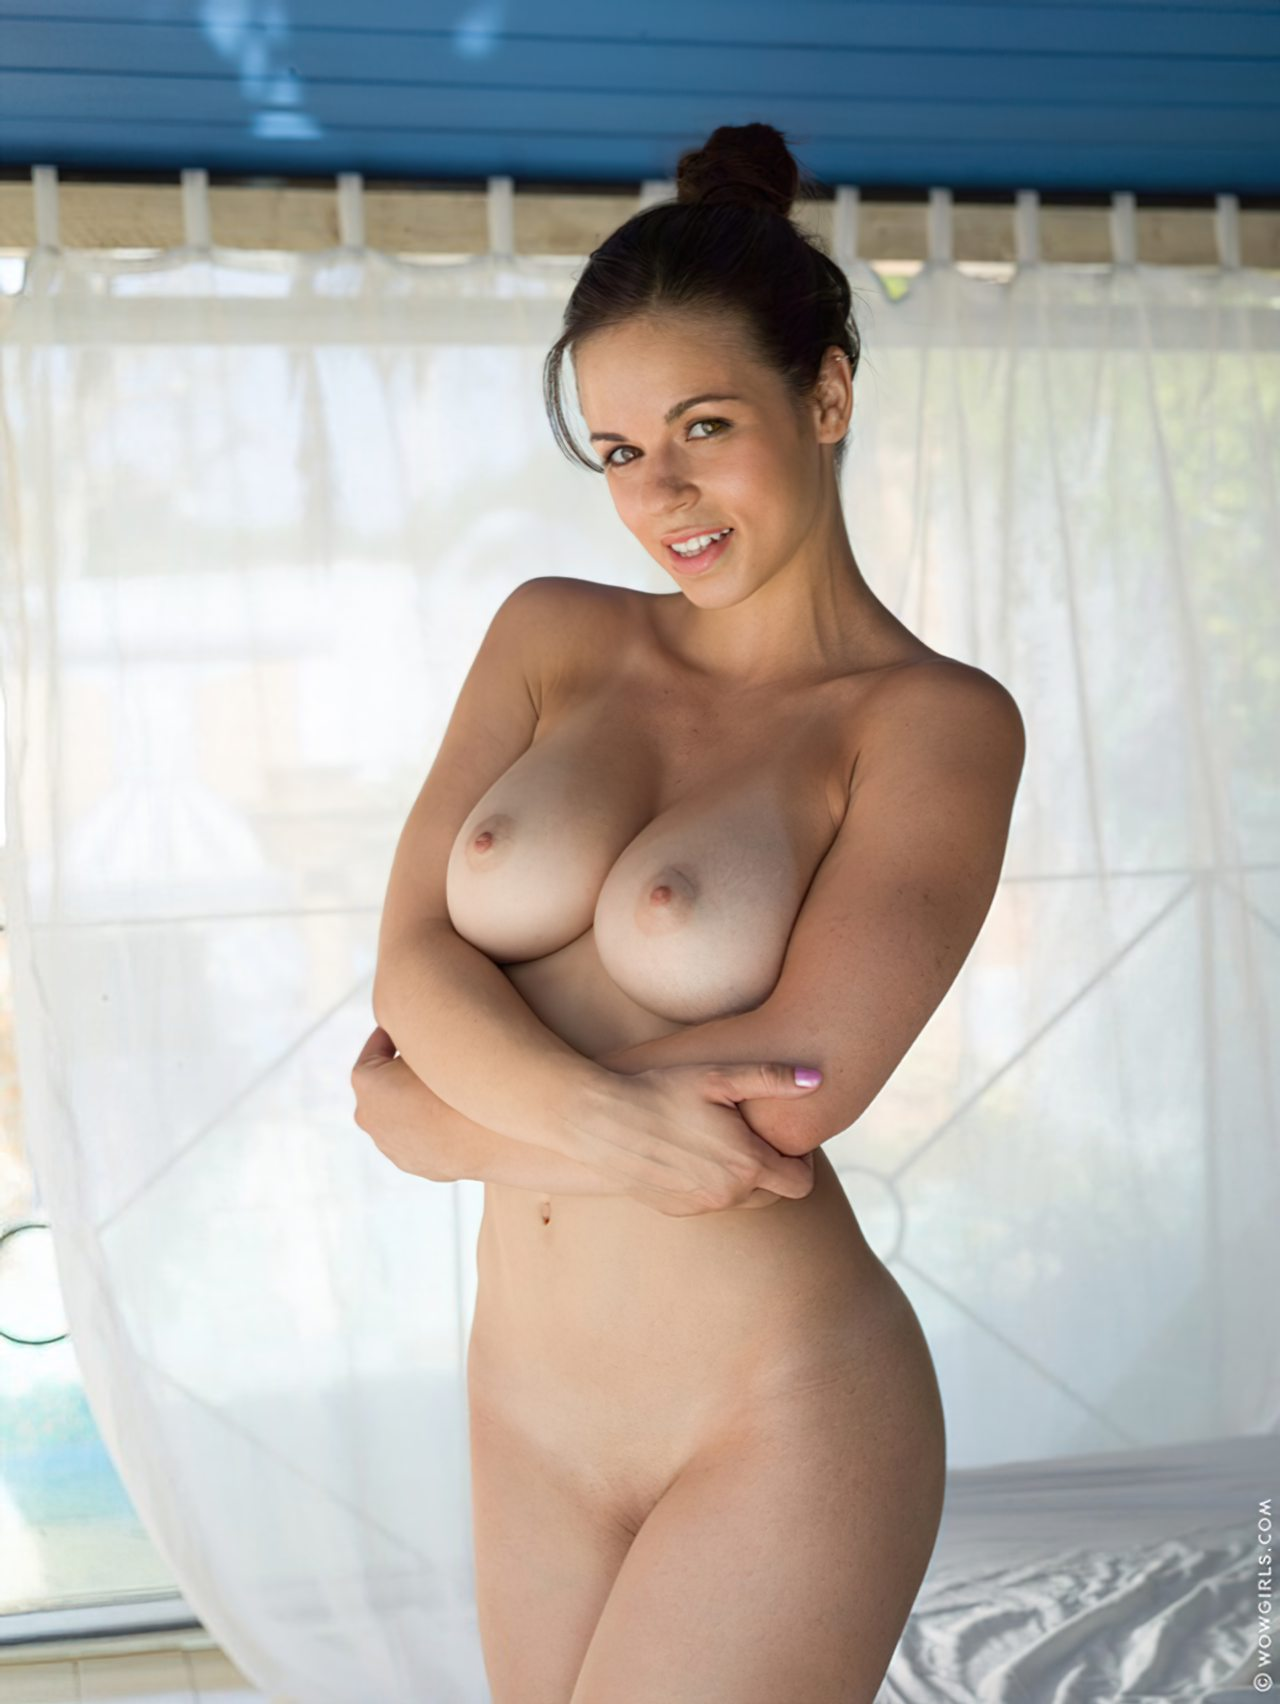 Mulher Nova Fazendo Striptease (6)